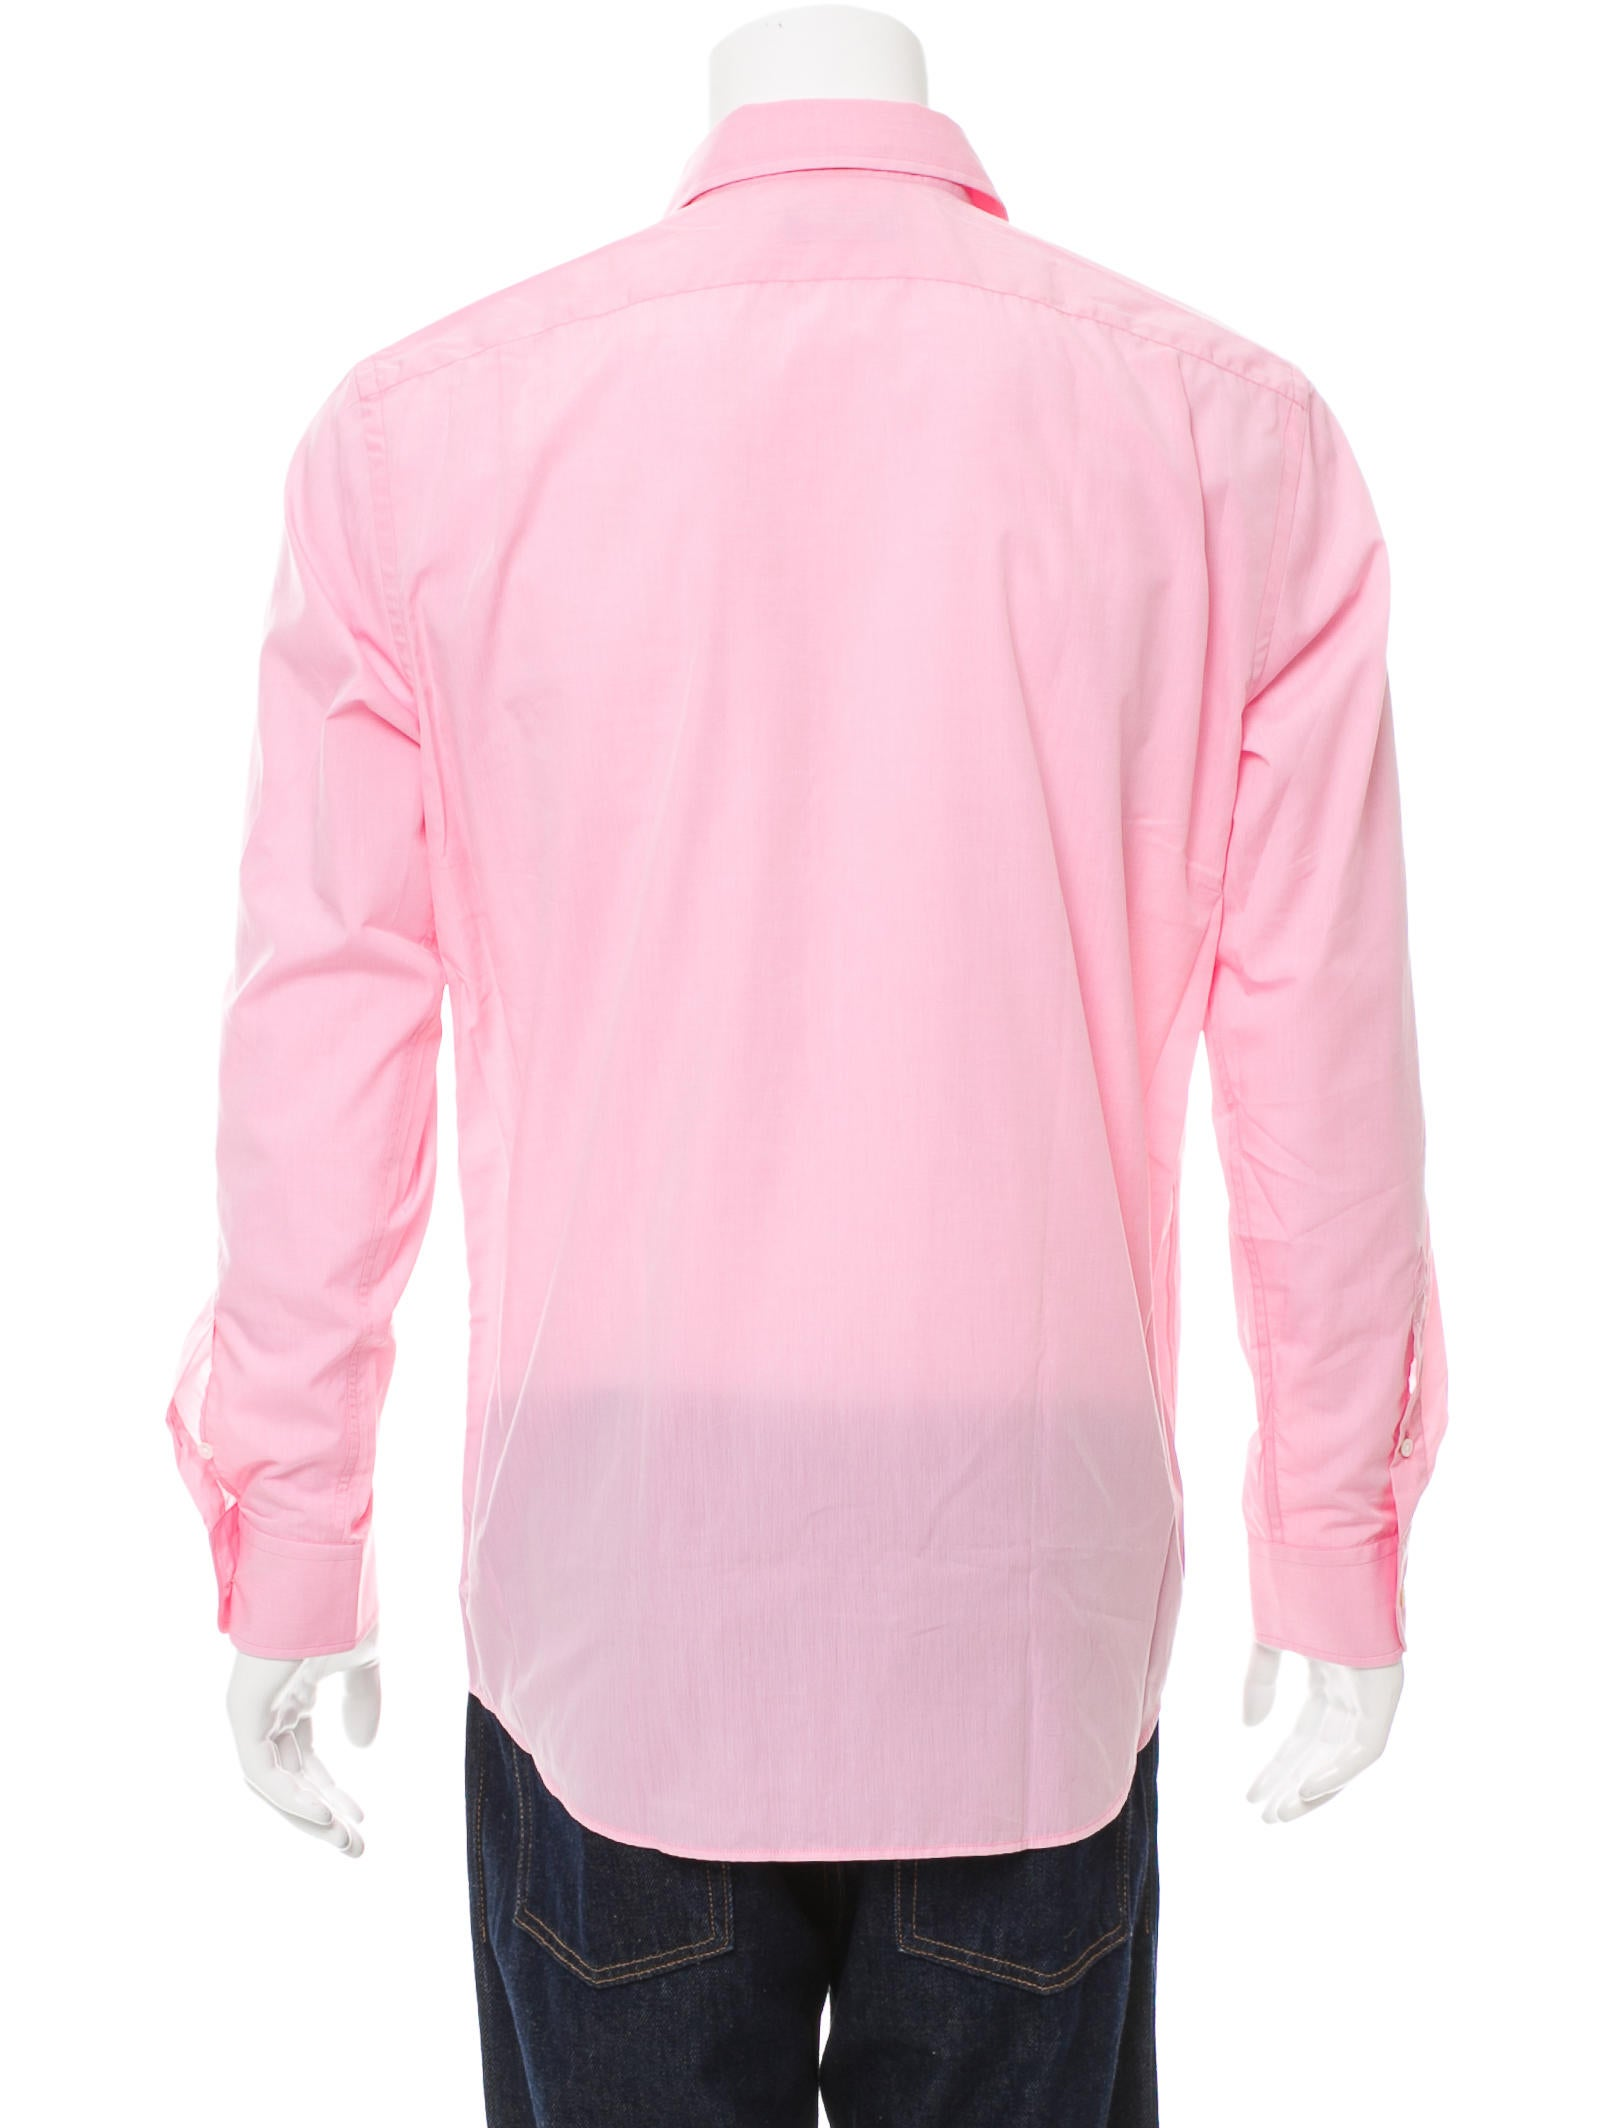 Ralph lauren purple label woven button up shirt w tags Woven t shirt tags